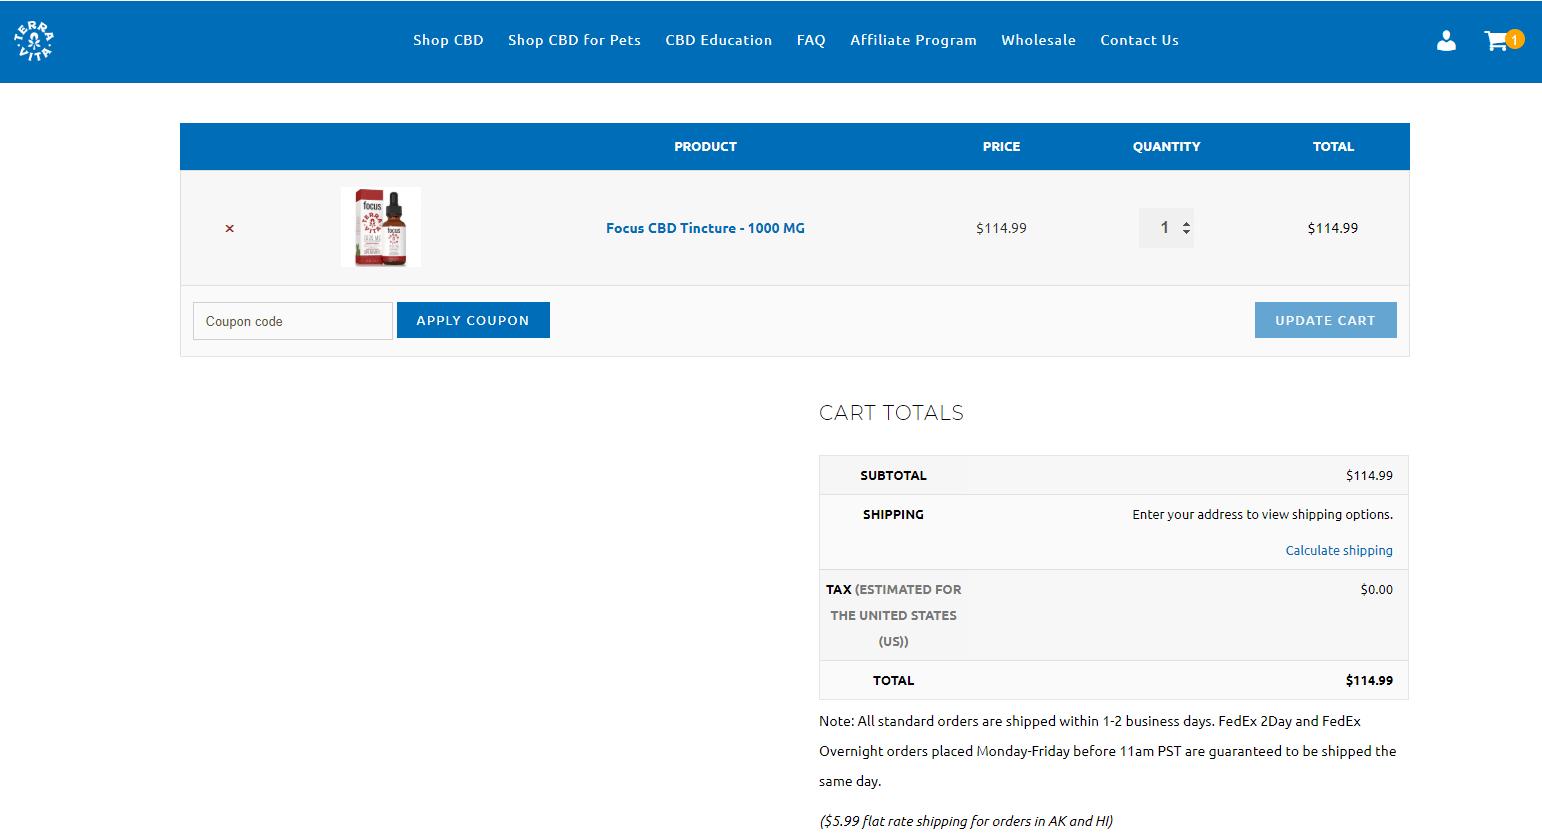 TerraVita CBD online coupon code